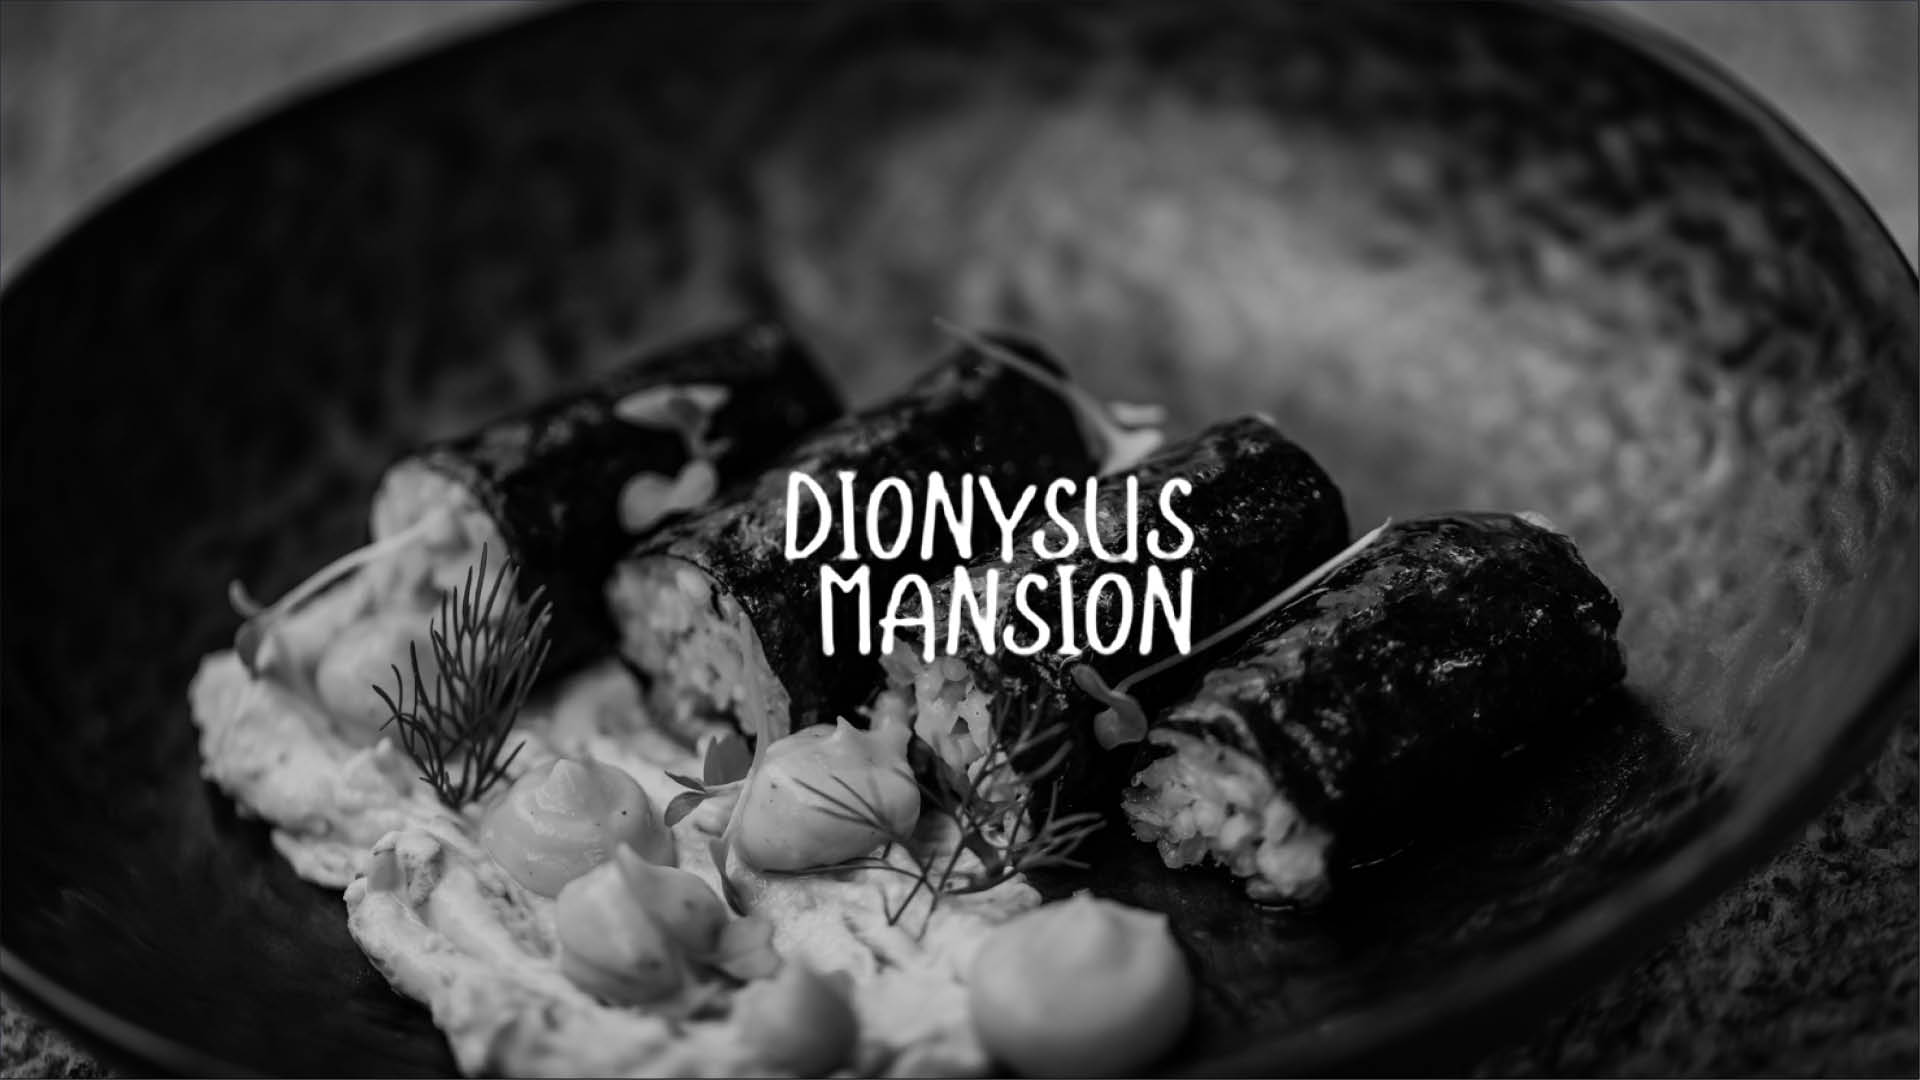 DIONYSUS MANSION